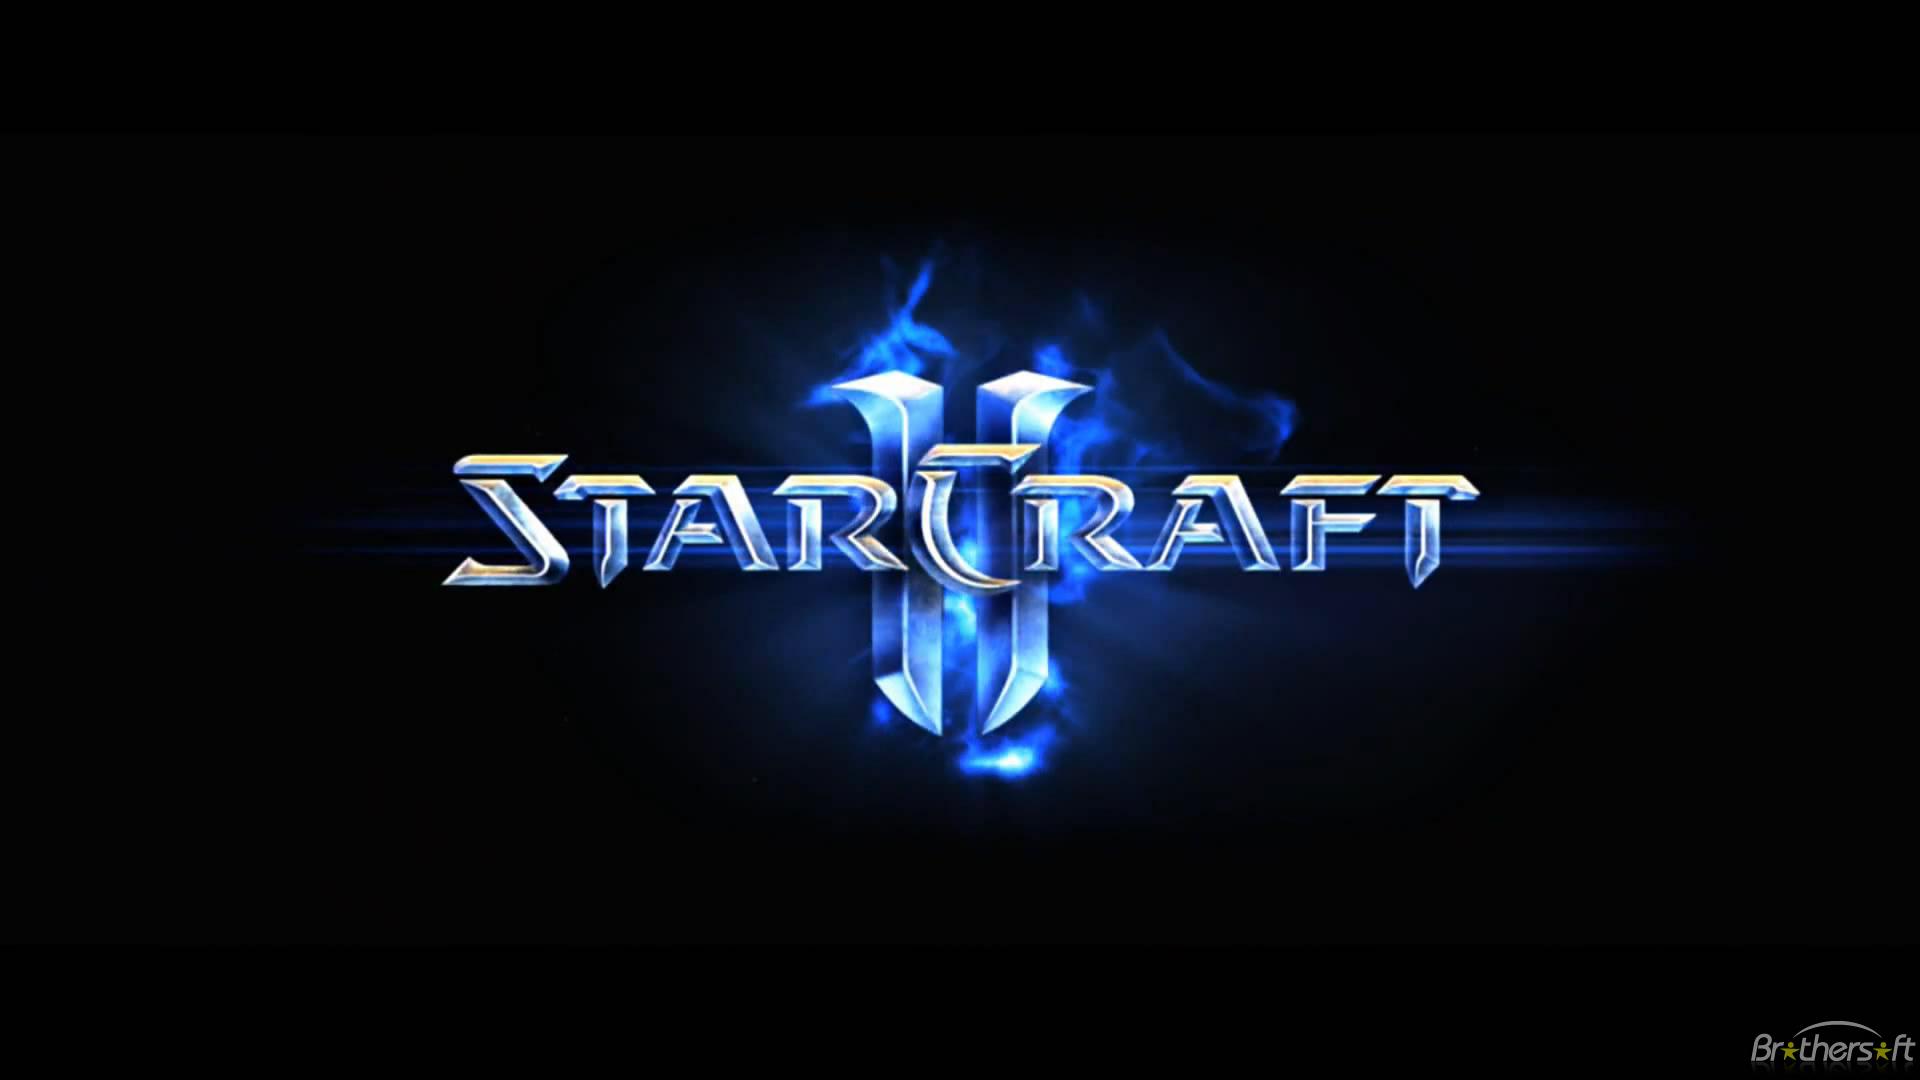 Starcraft 2 Wallpaper 1920x1200 ImageBankbiz 1920x1080